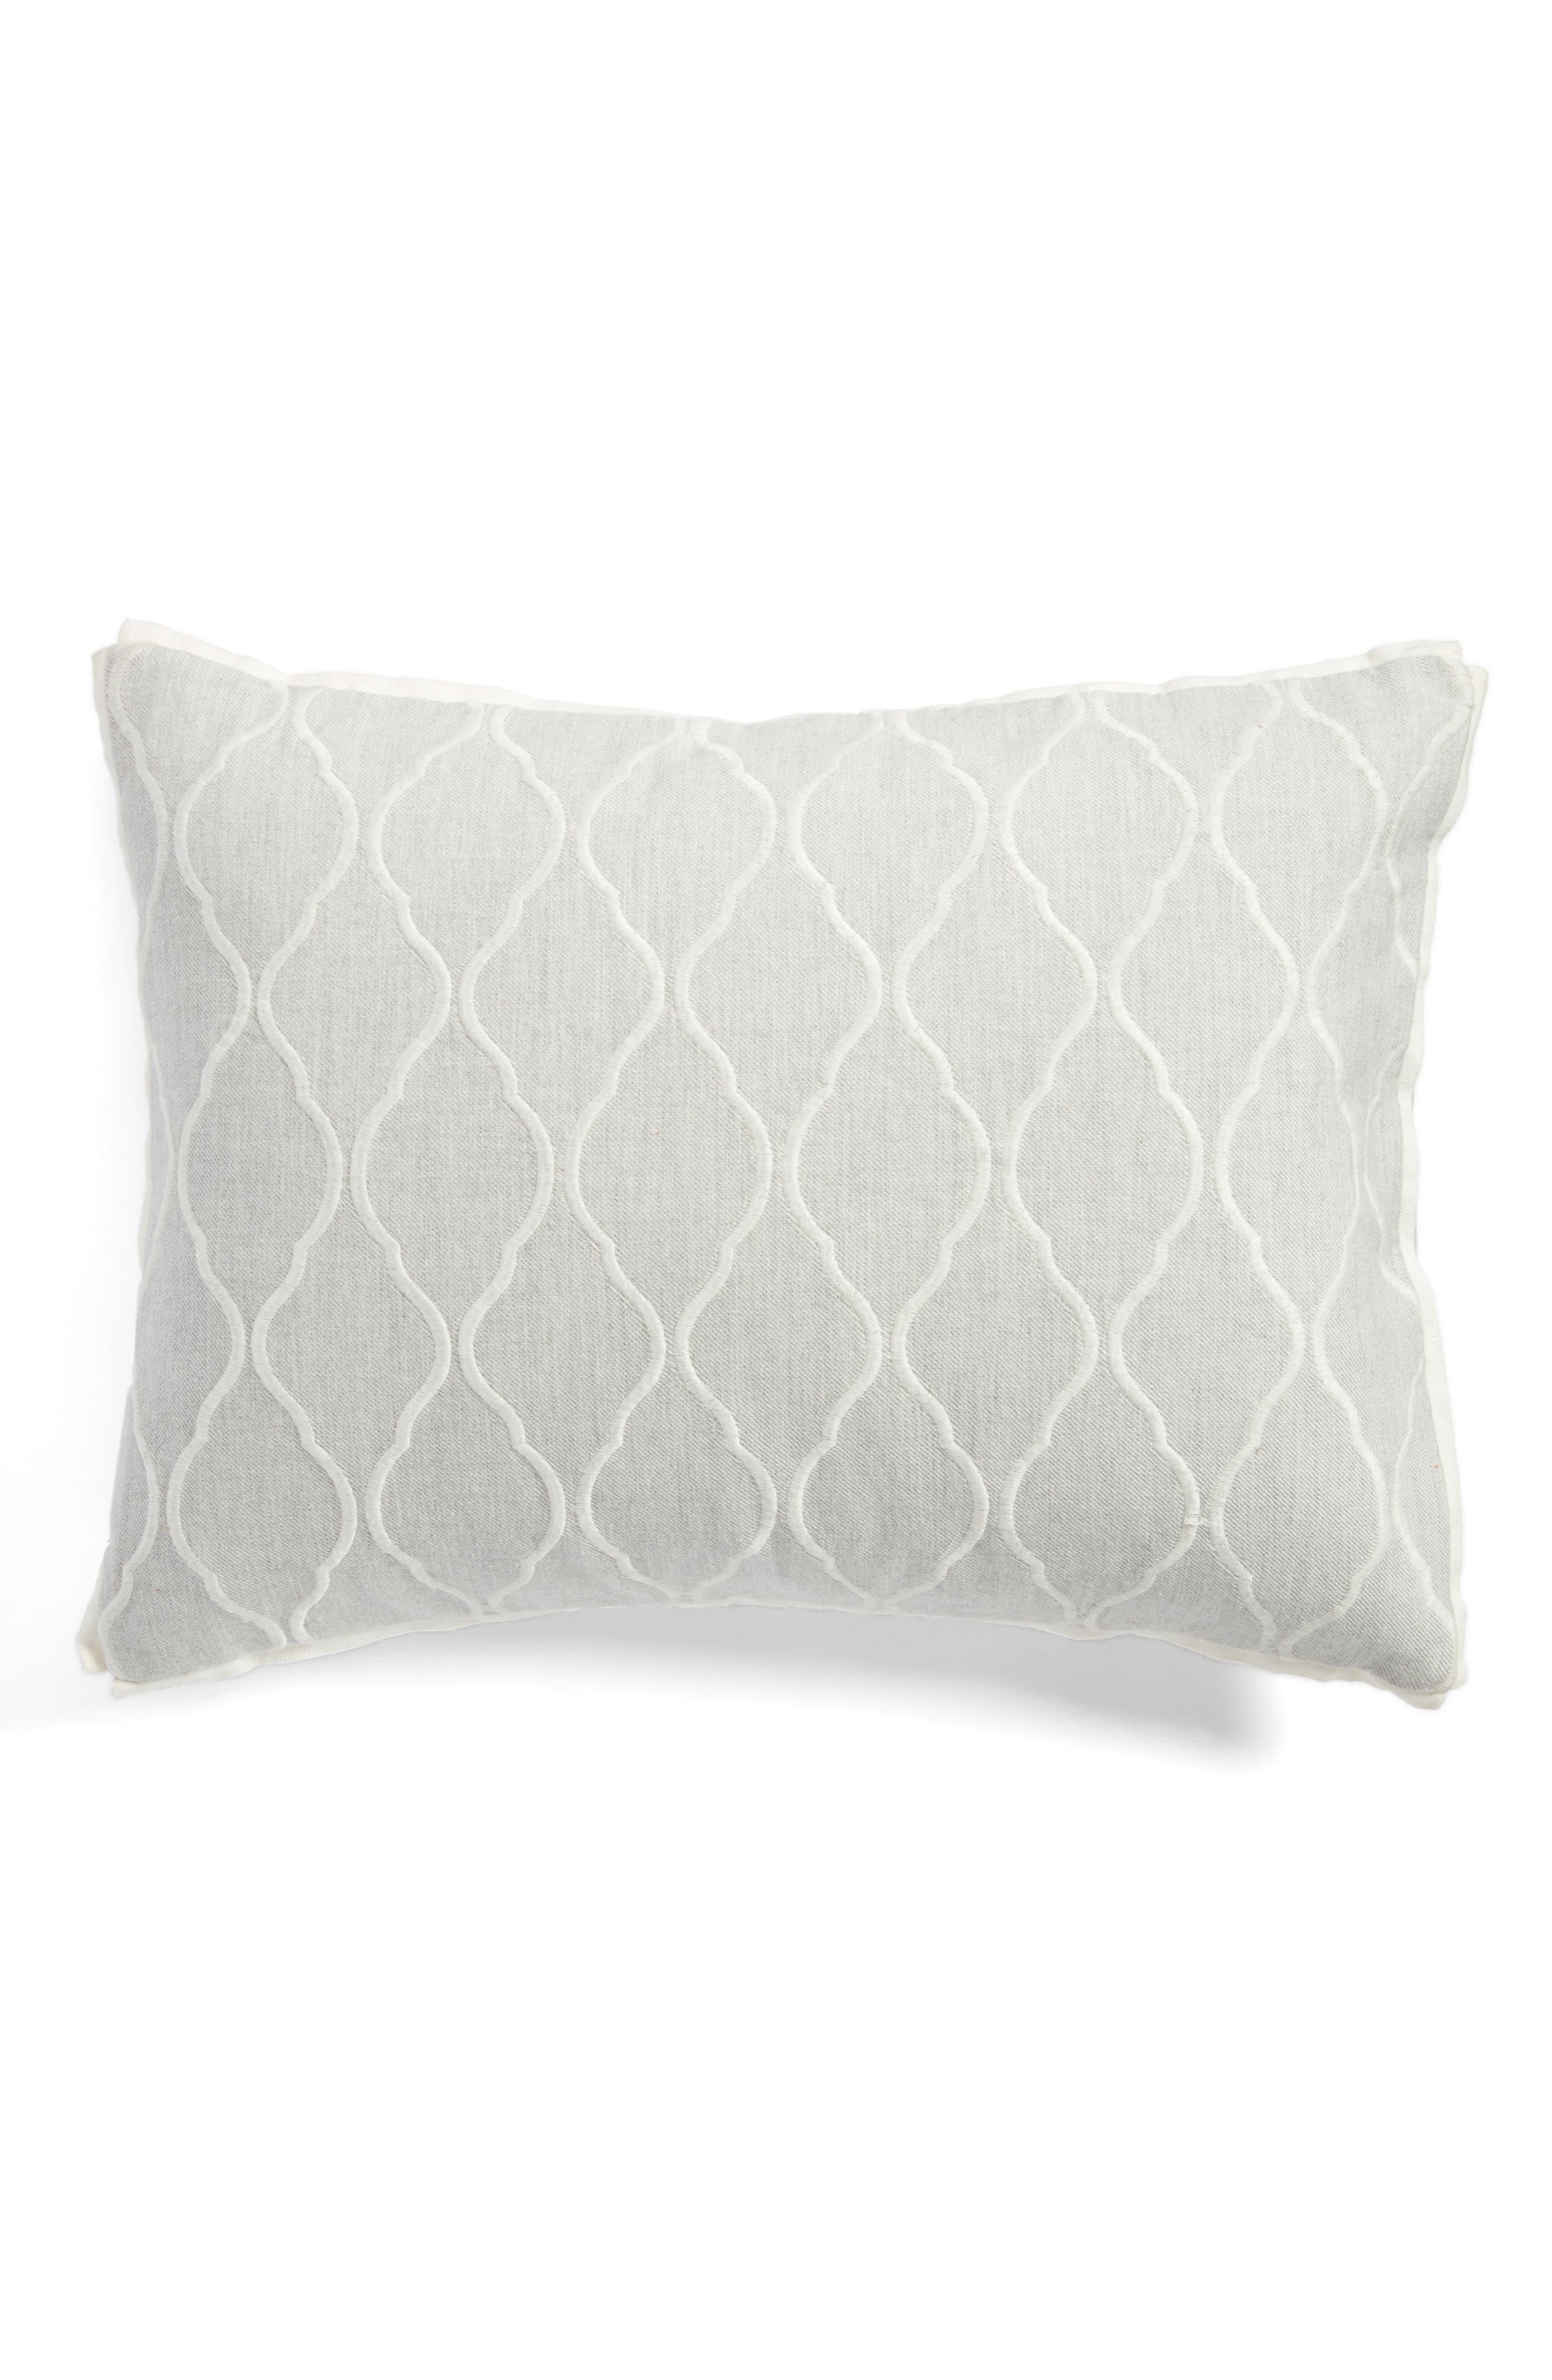 Vera Wang Fretwork Breakfast Pillow